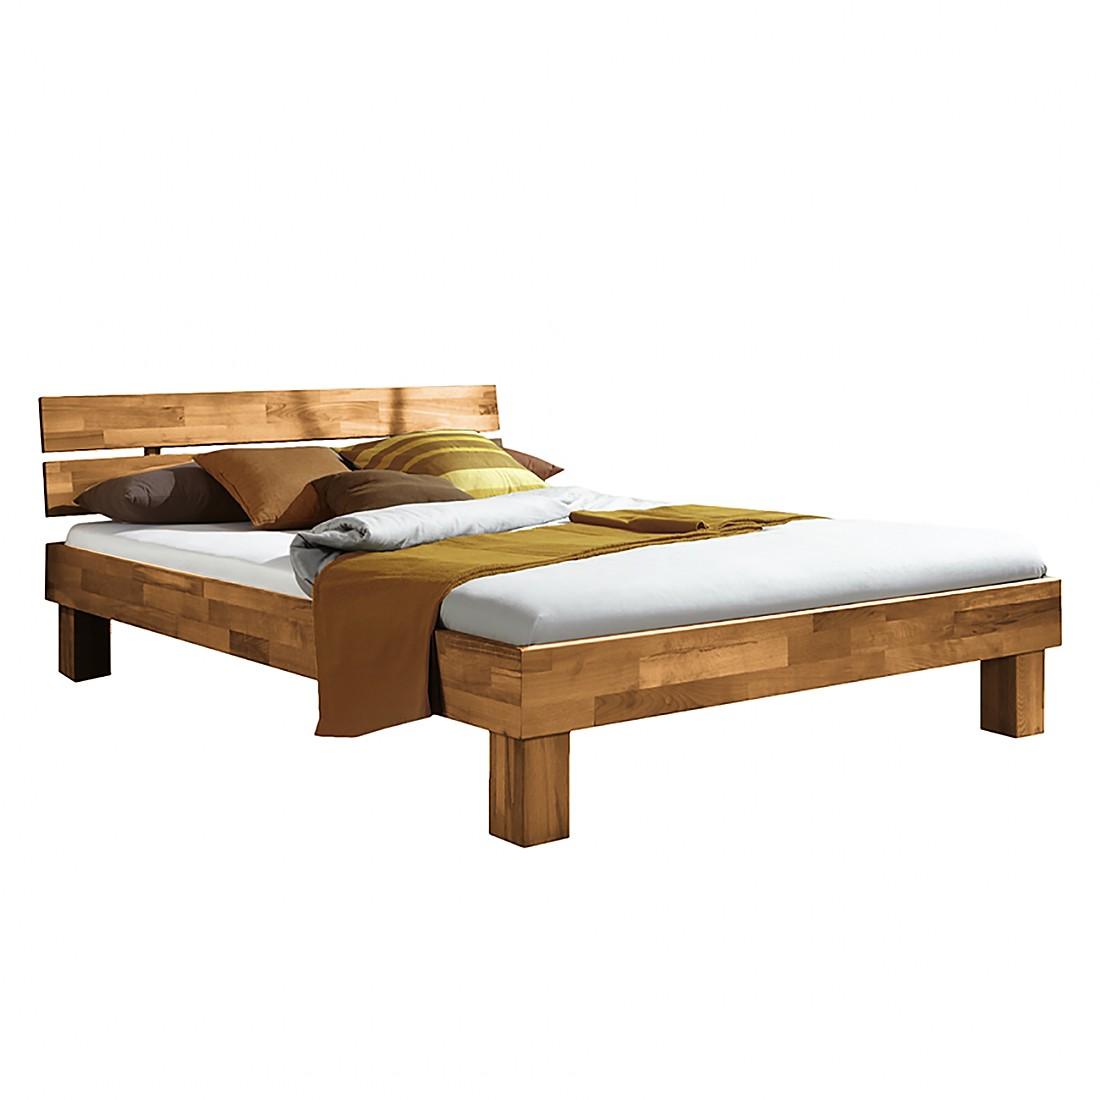 goedkoop Massief houten bed SonaWOOD geolied massief wild eikenhout 140 x 200cm Ars Natura